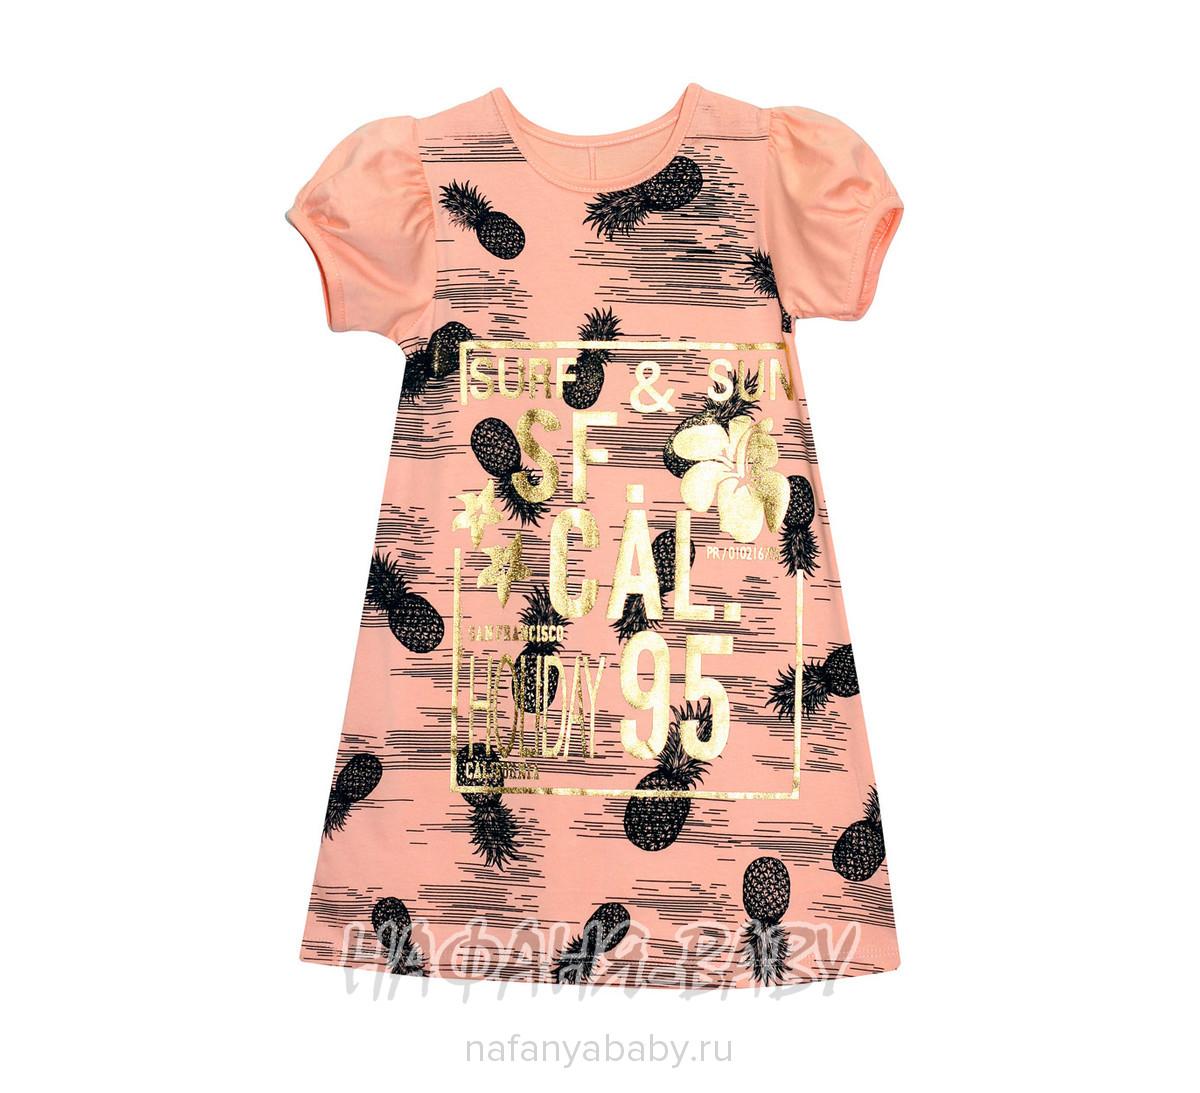 Детское платье AKIRA арт: 2102, 1-4 года, 5-9 лет, оптом Турция